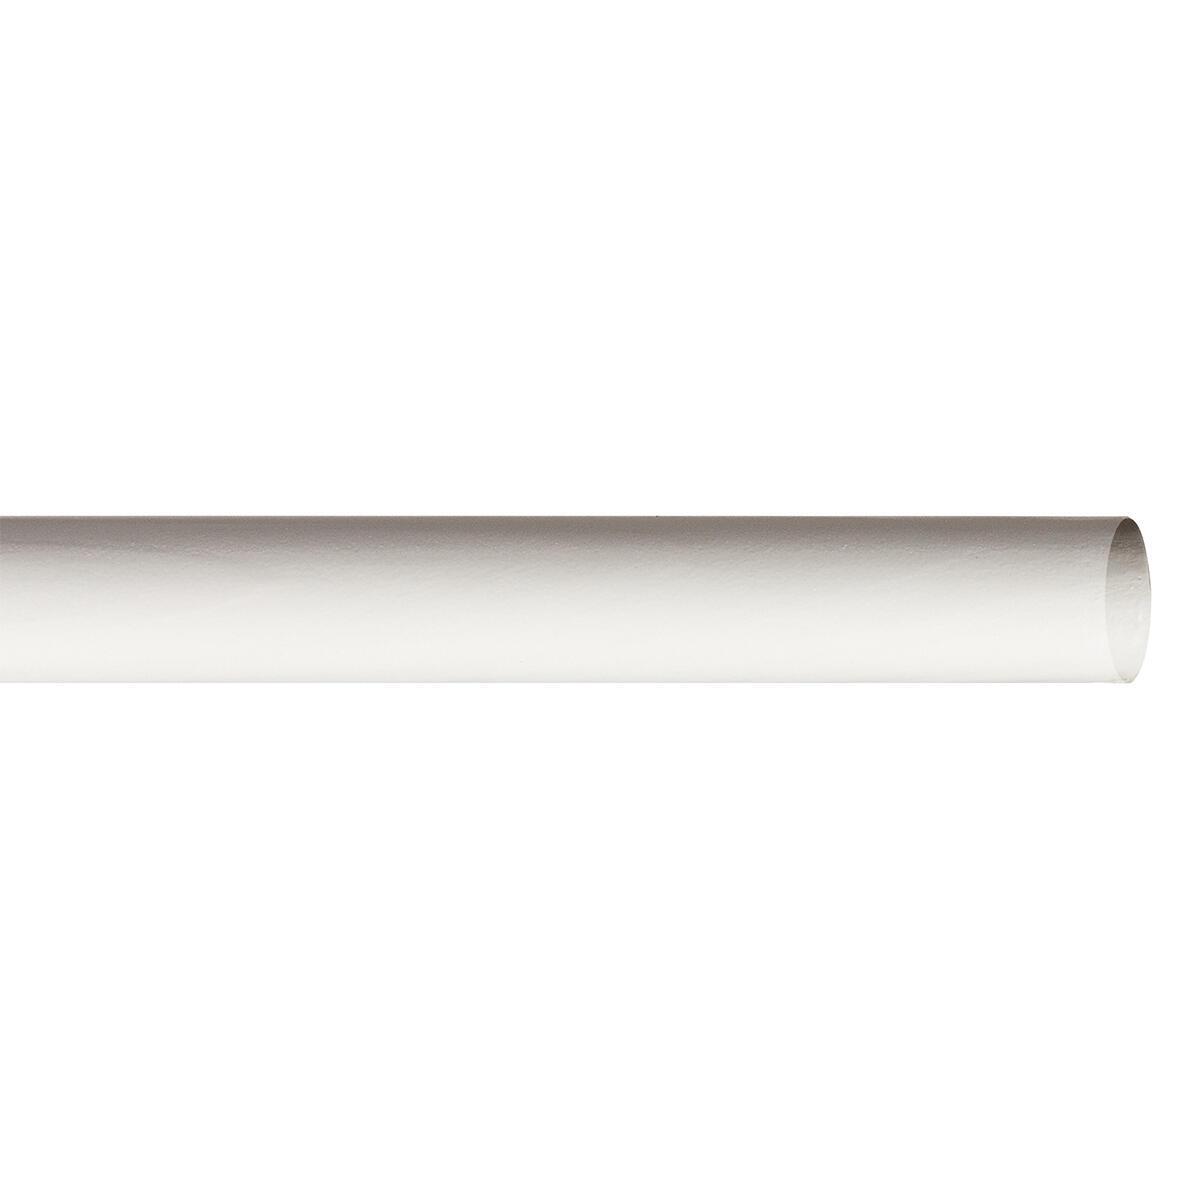 Bastone per tenda Brest in legno Ø 28 mm bianco opaco 240 cm